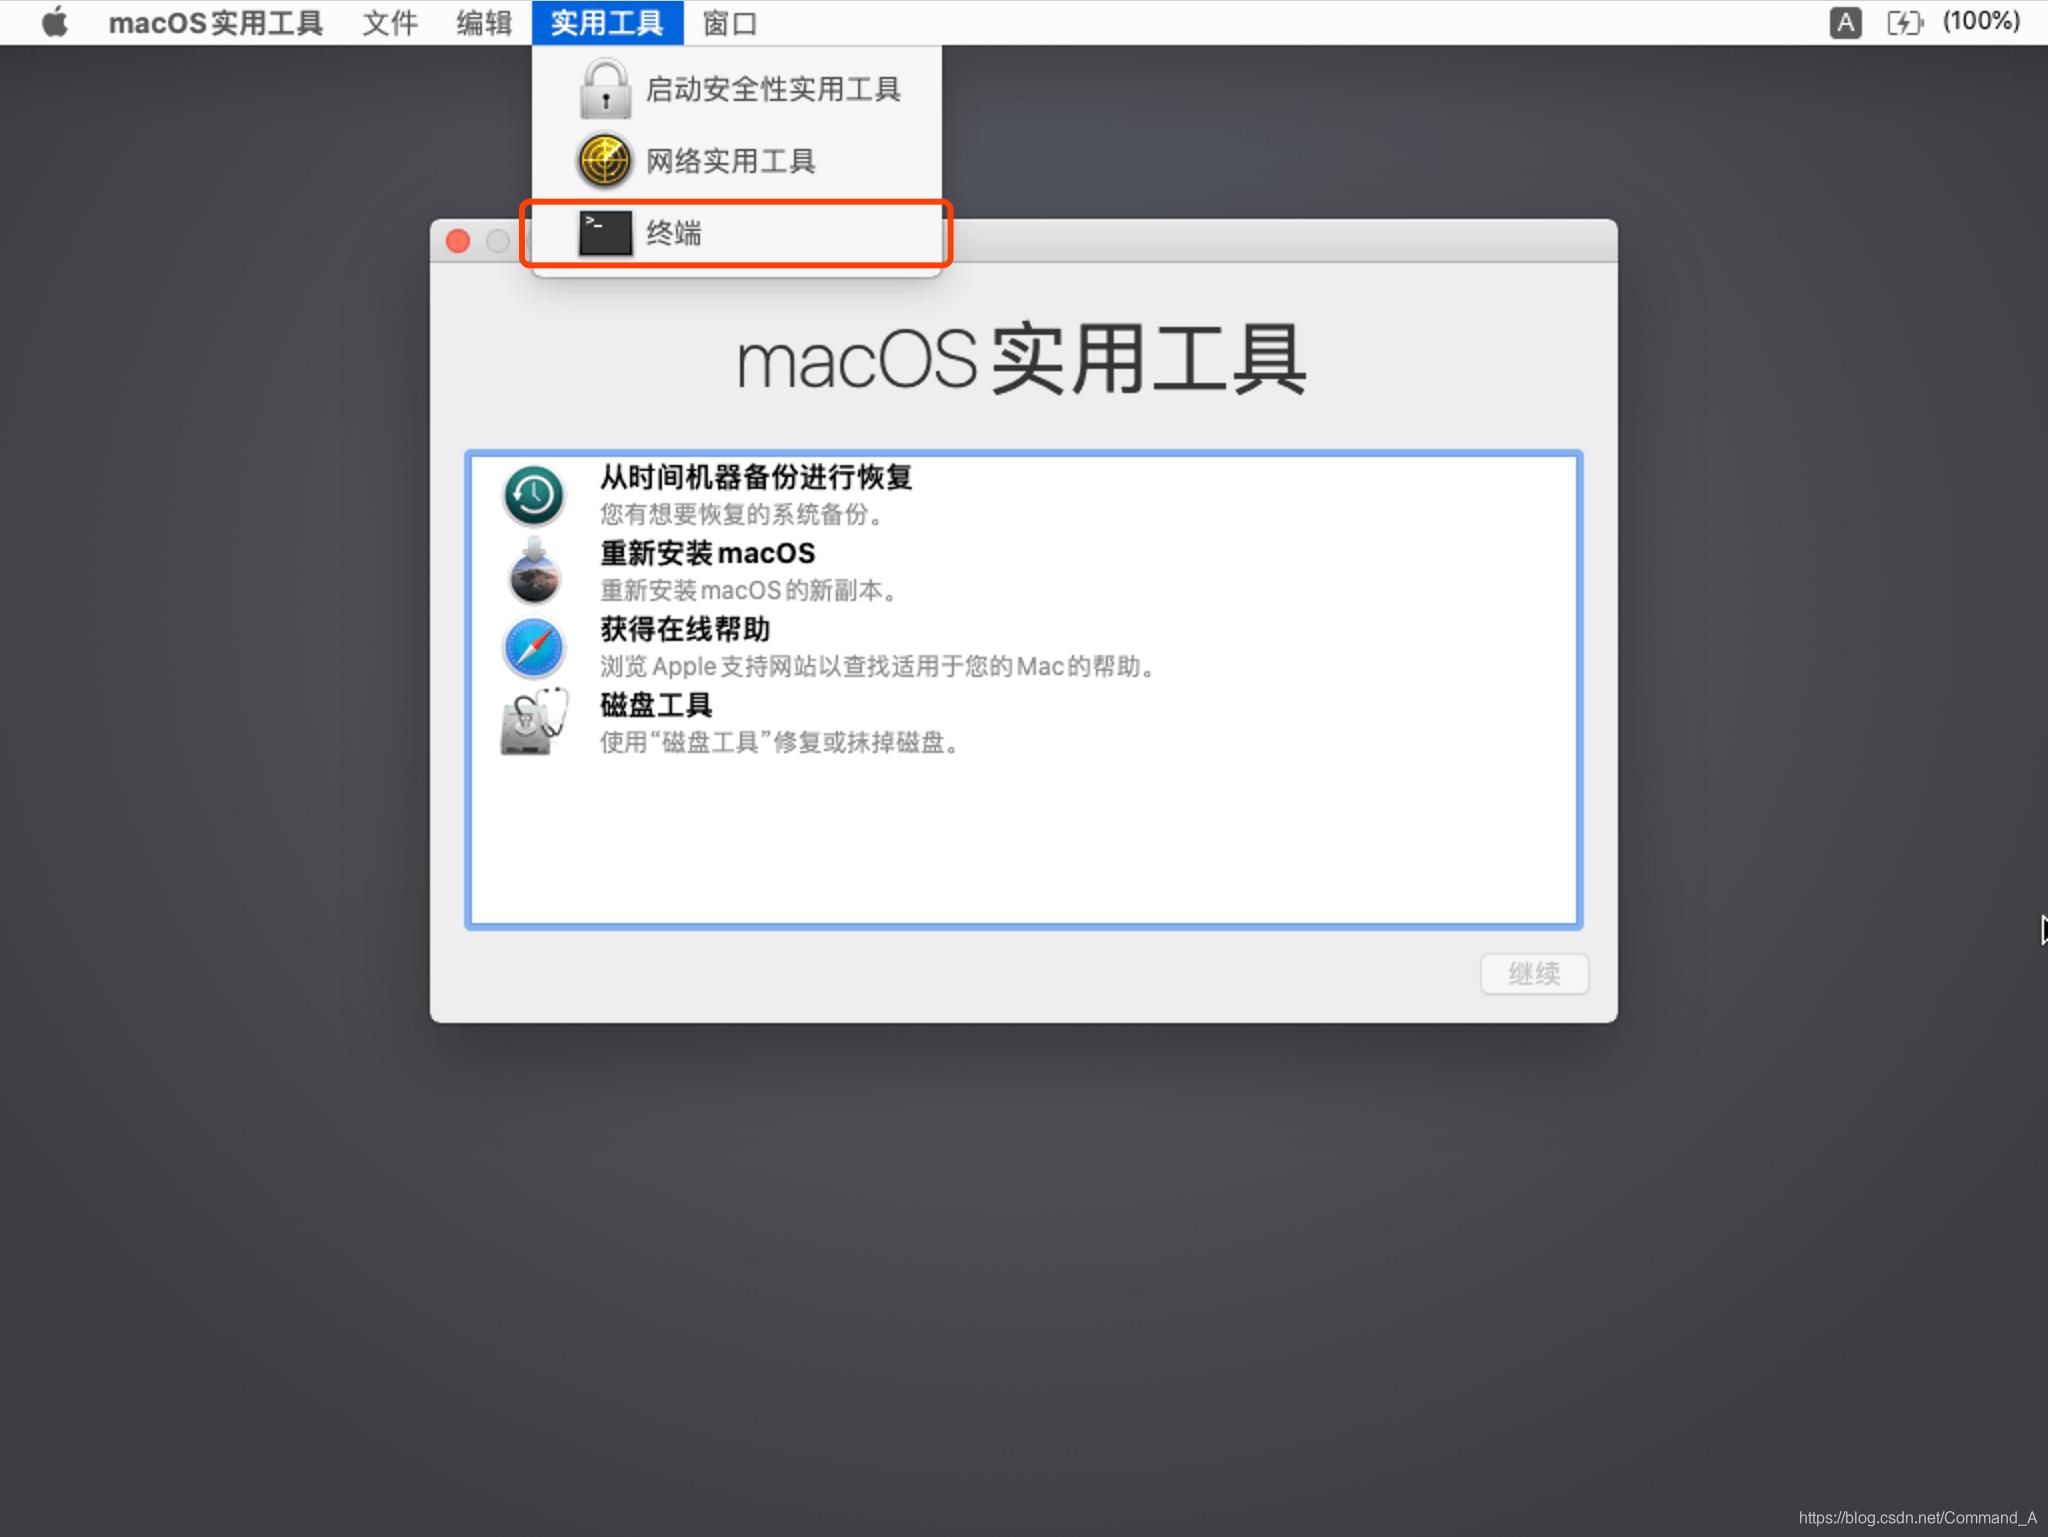 macOS关闭和开启SIP